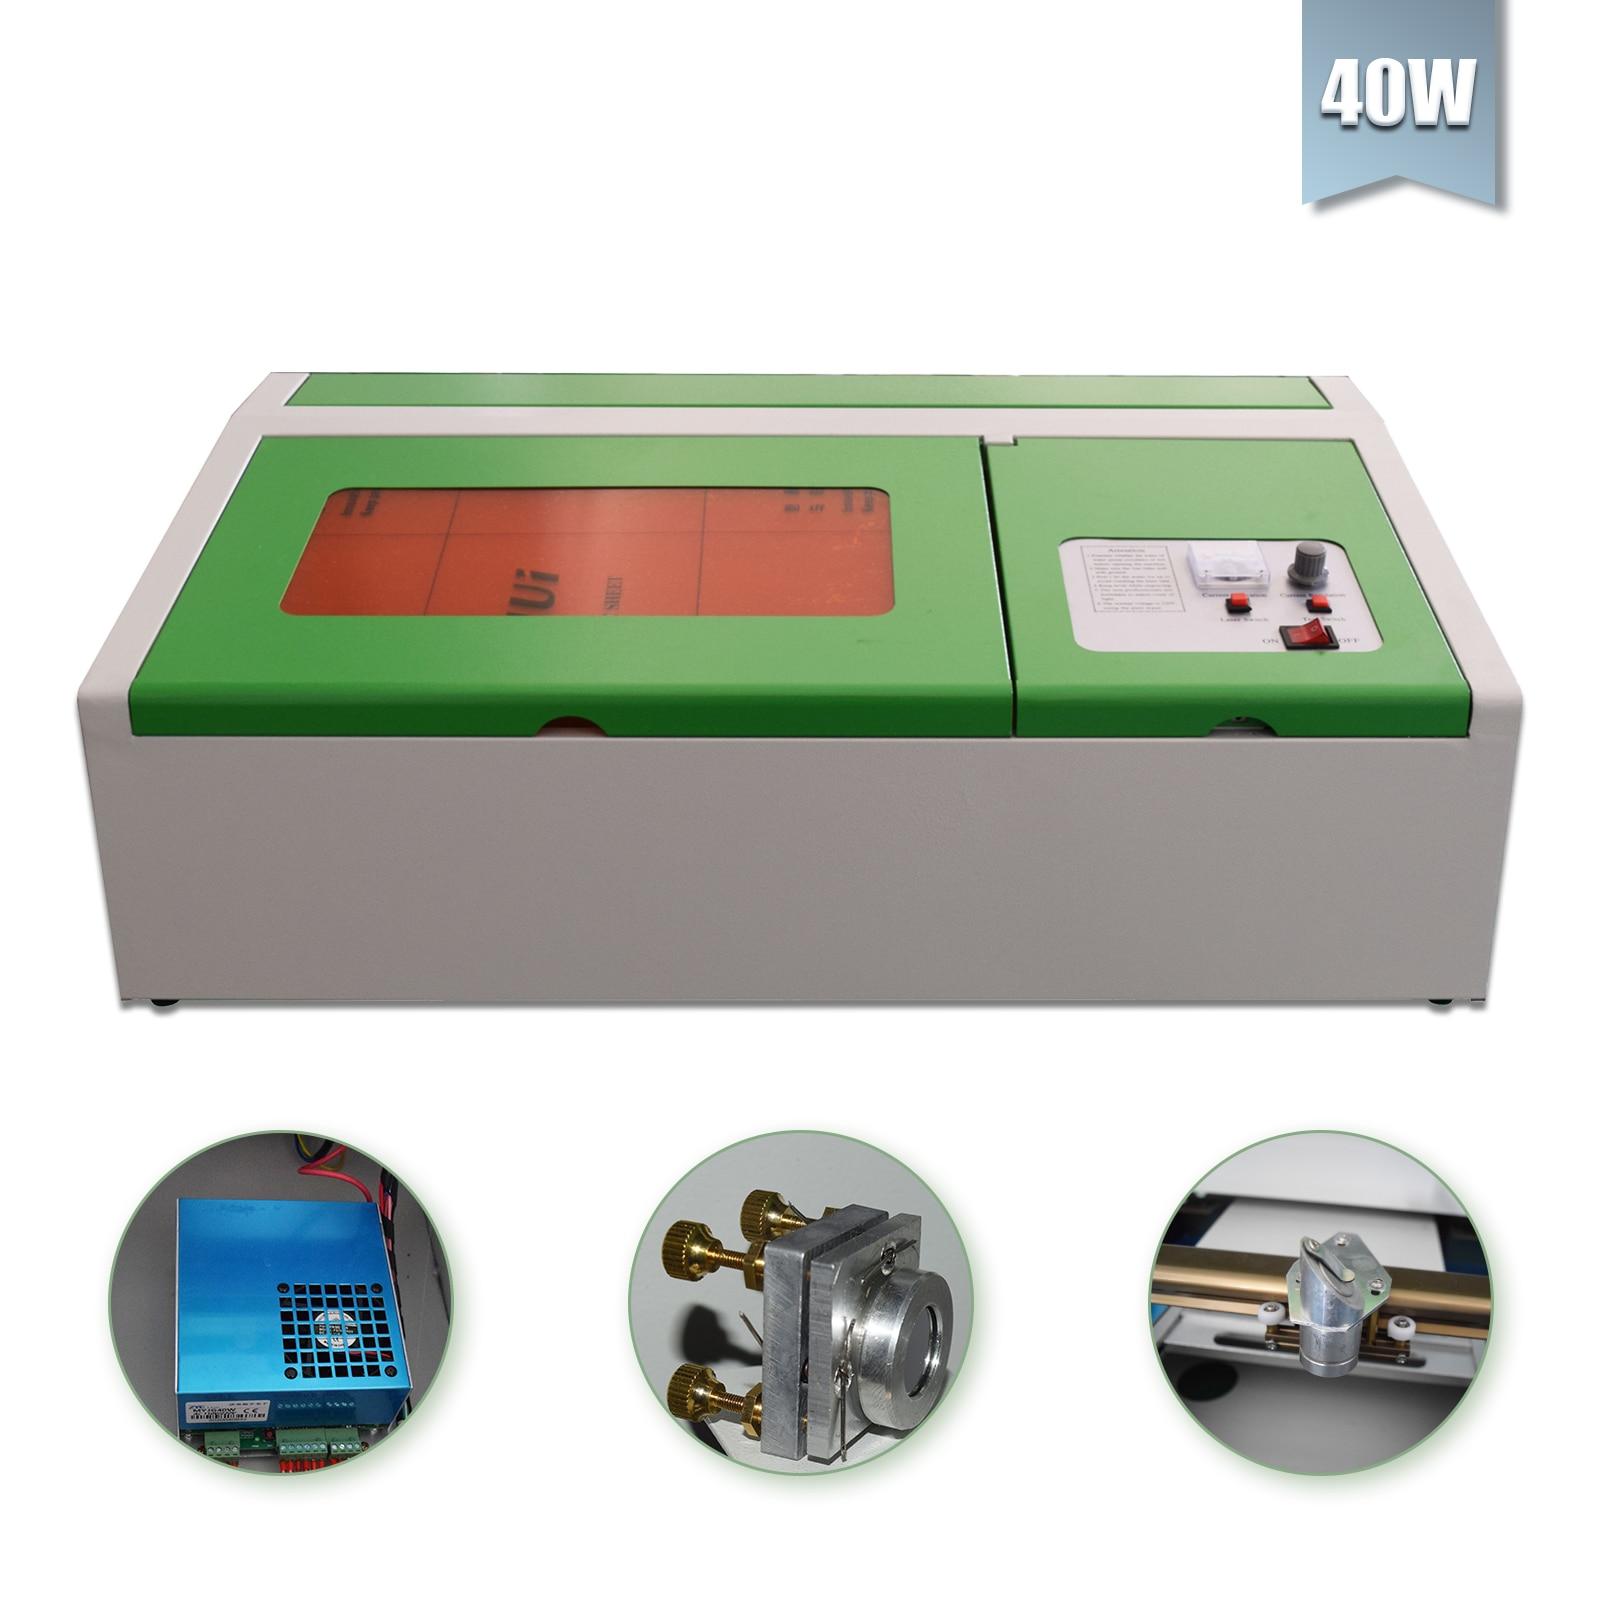 Máquina cortadora de grabado láser CO2 USB de 40W, cortador de grabado de madera de 300x200mm